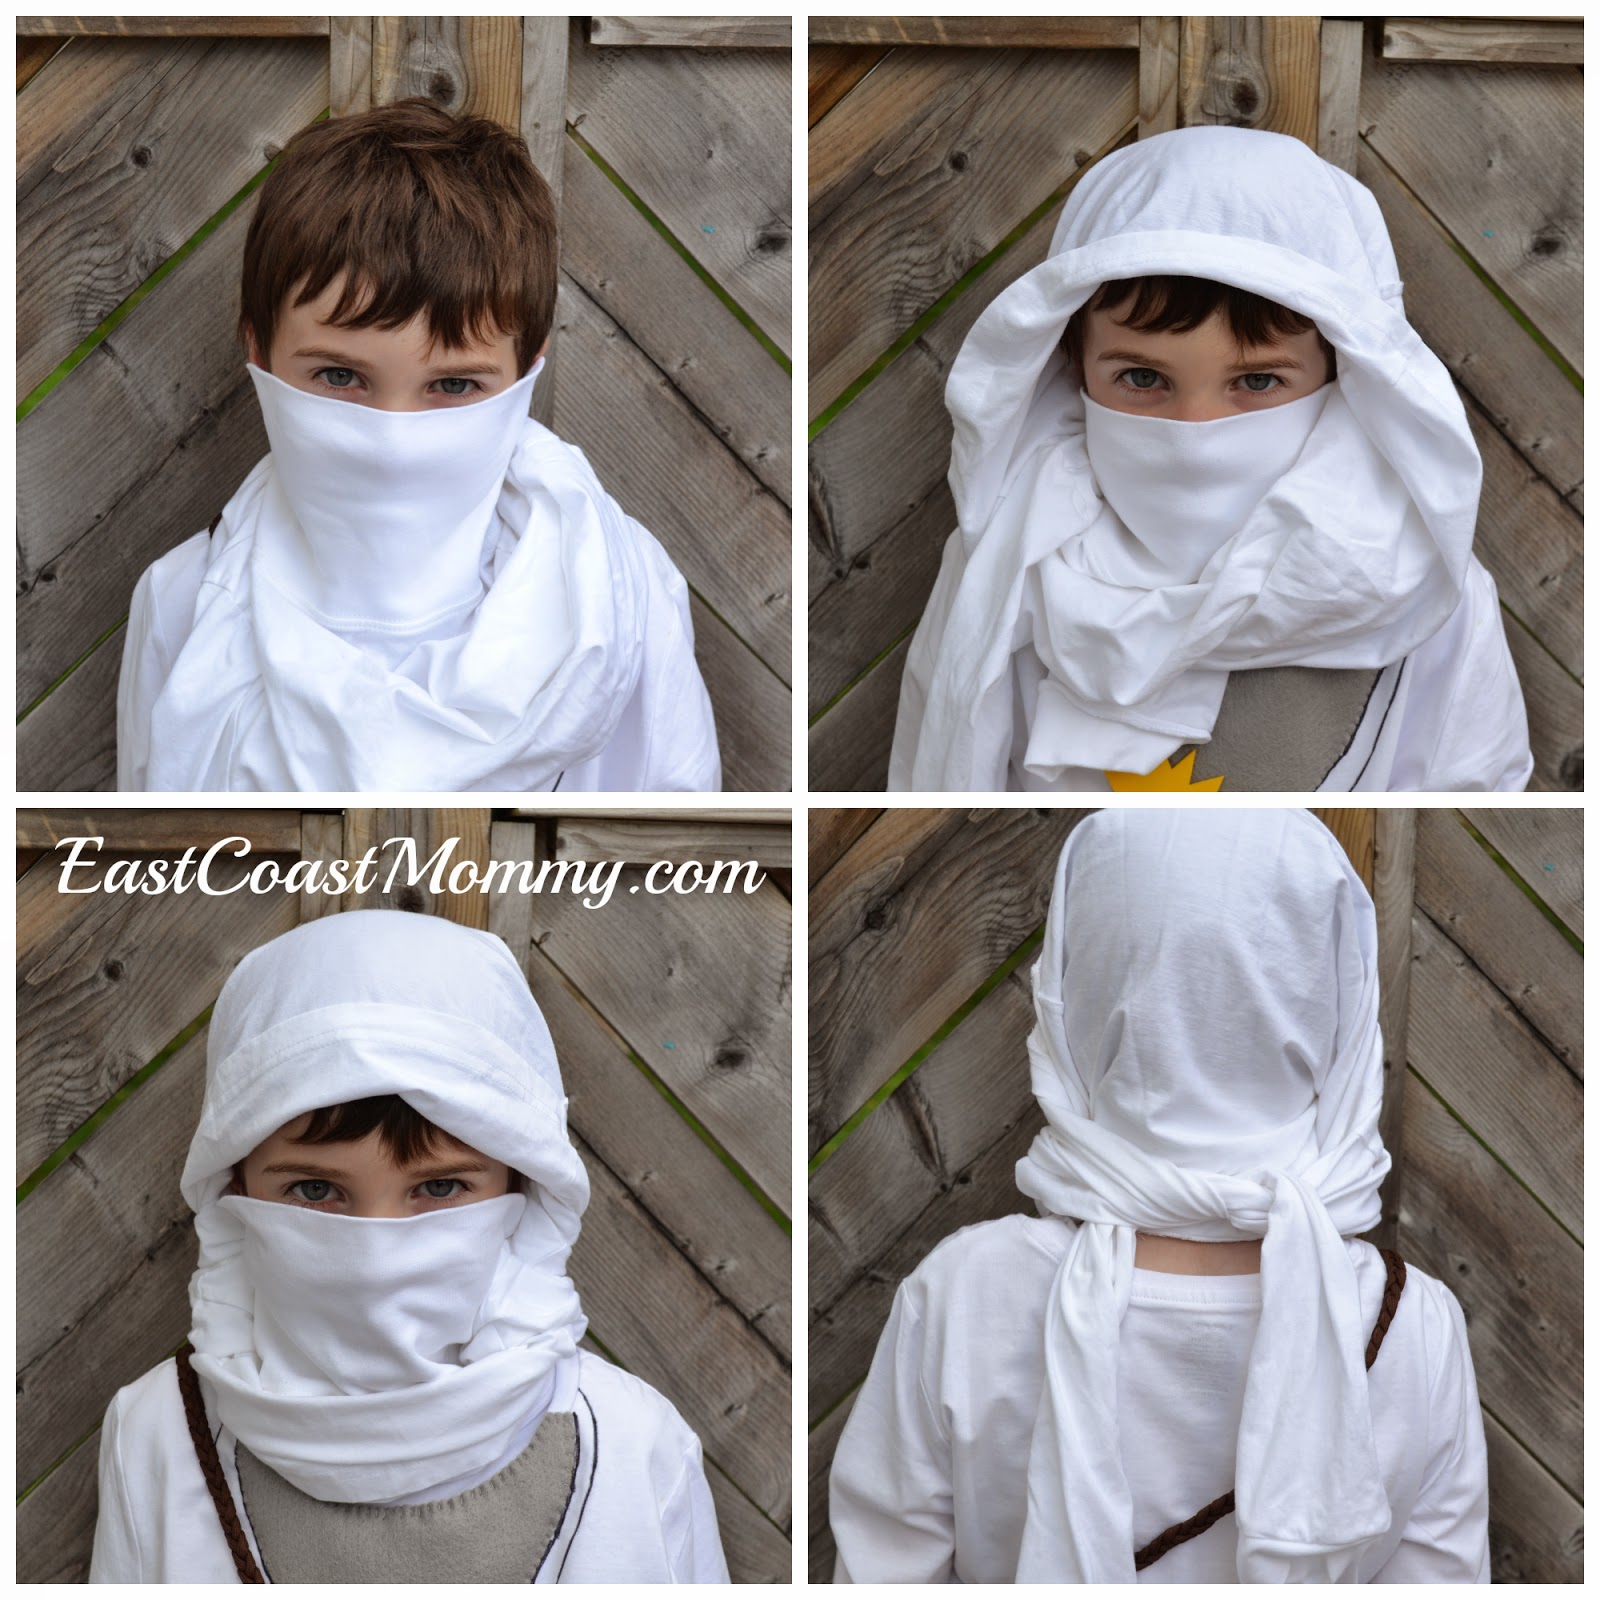 east coast mommy easy black ninja costume no sewing. Black Bedroom Furniture Sets. Home Design Ideas